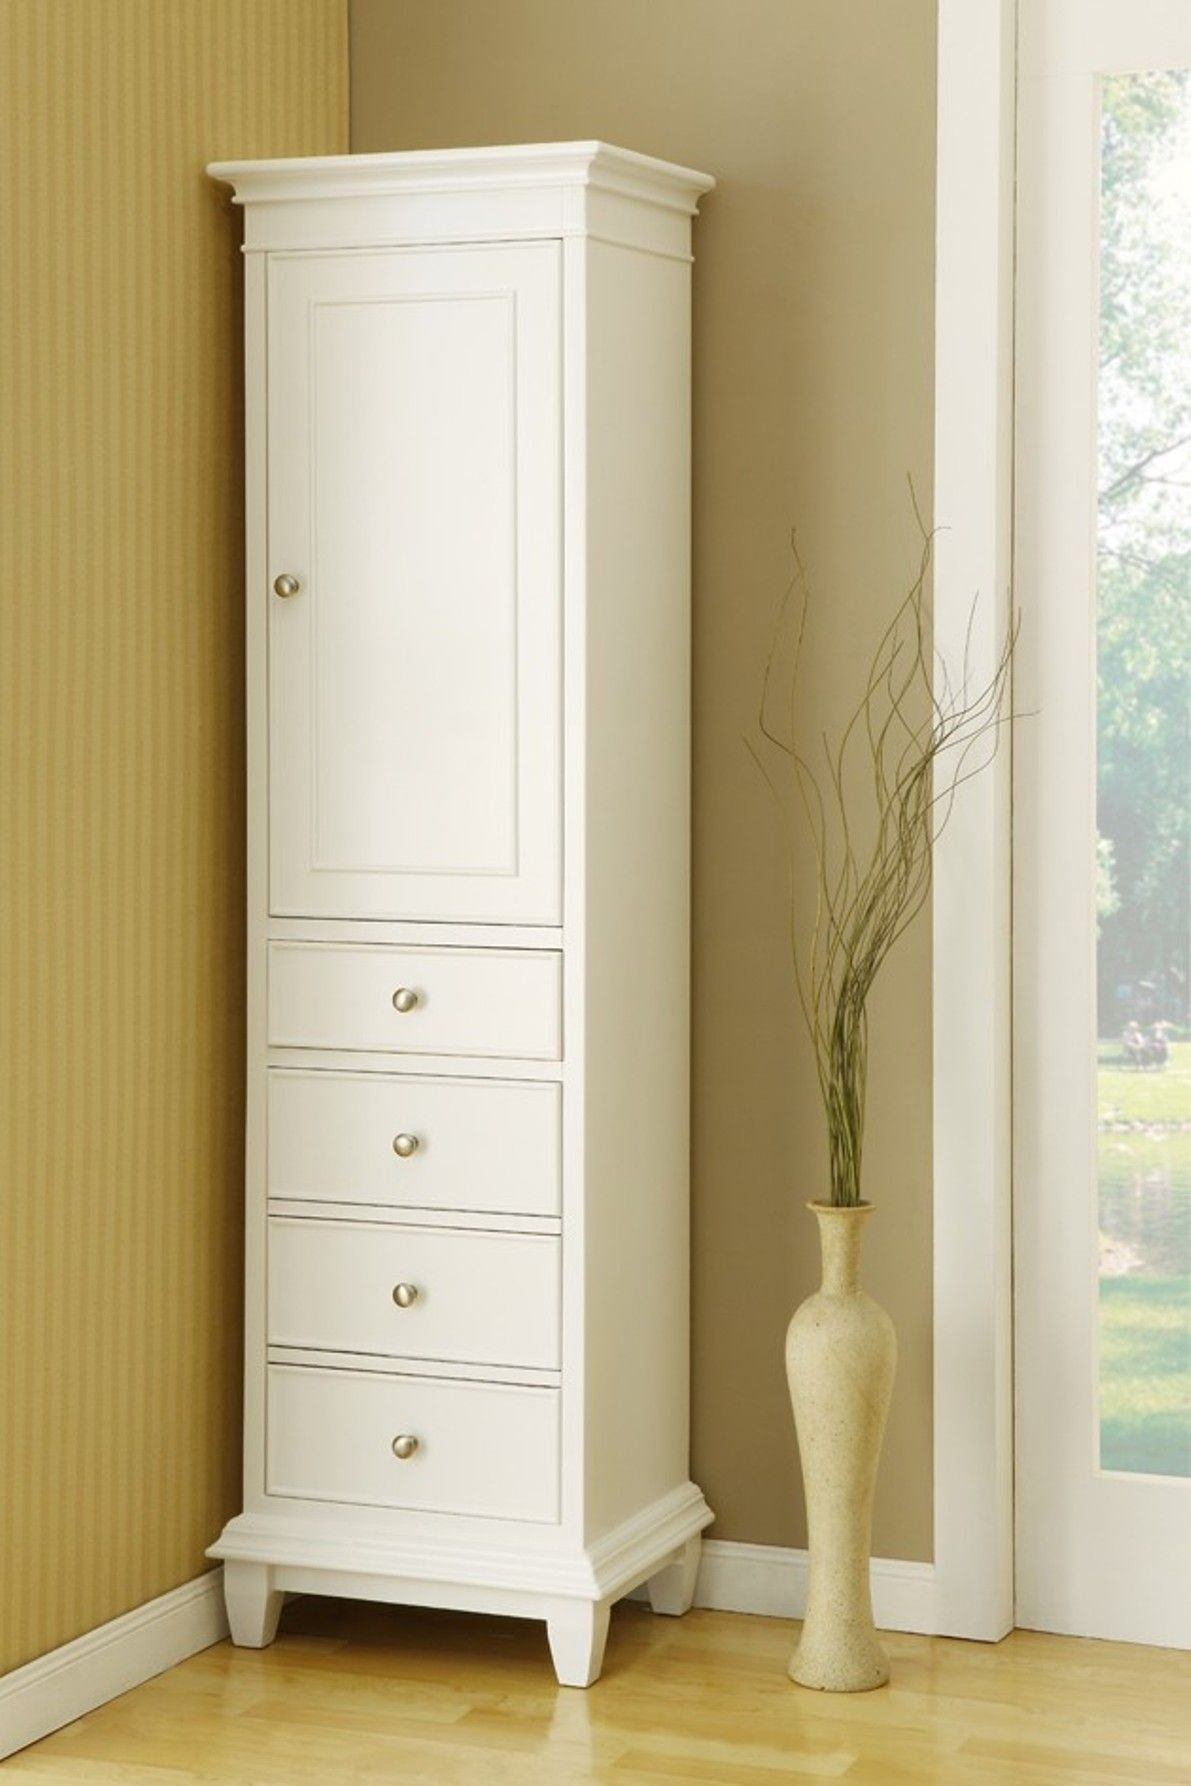 free standing linen cabinets ideas on foter rh foter com